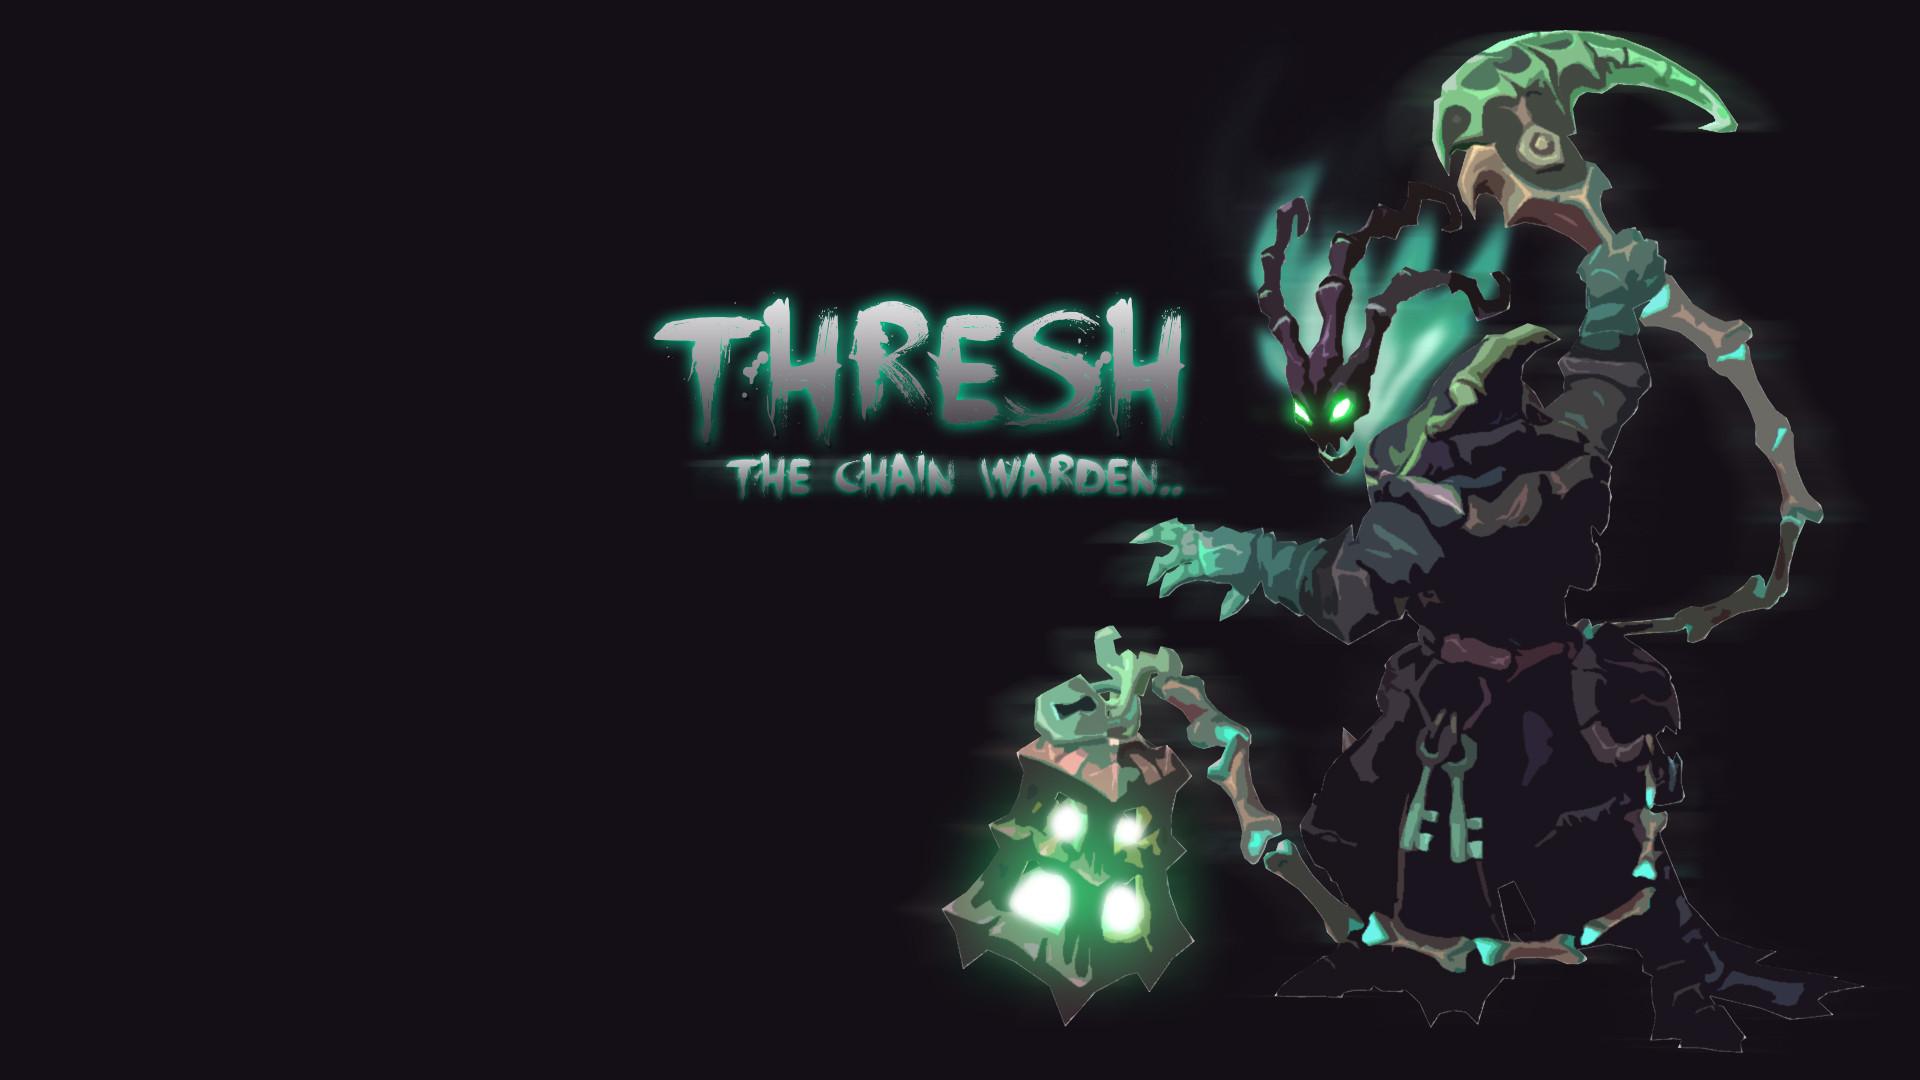 Thresh done: …